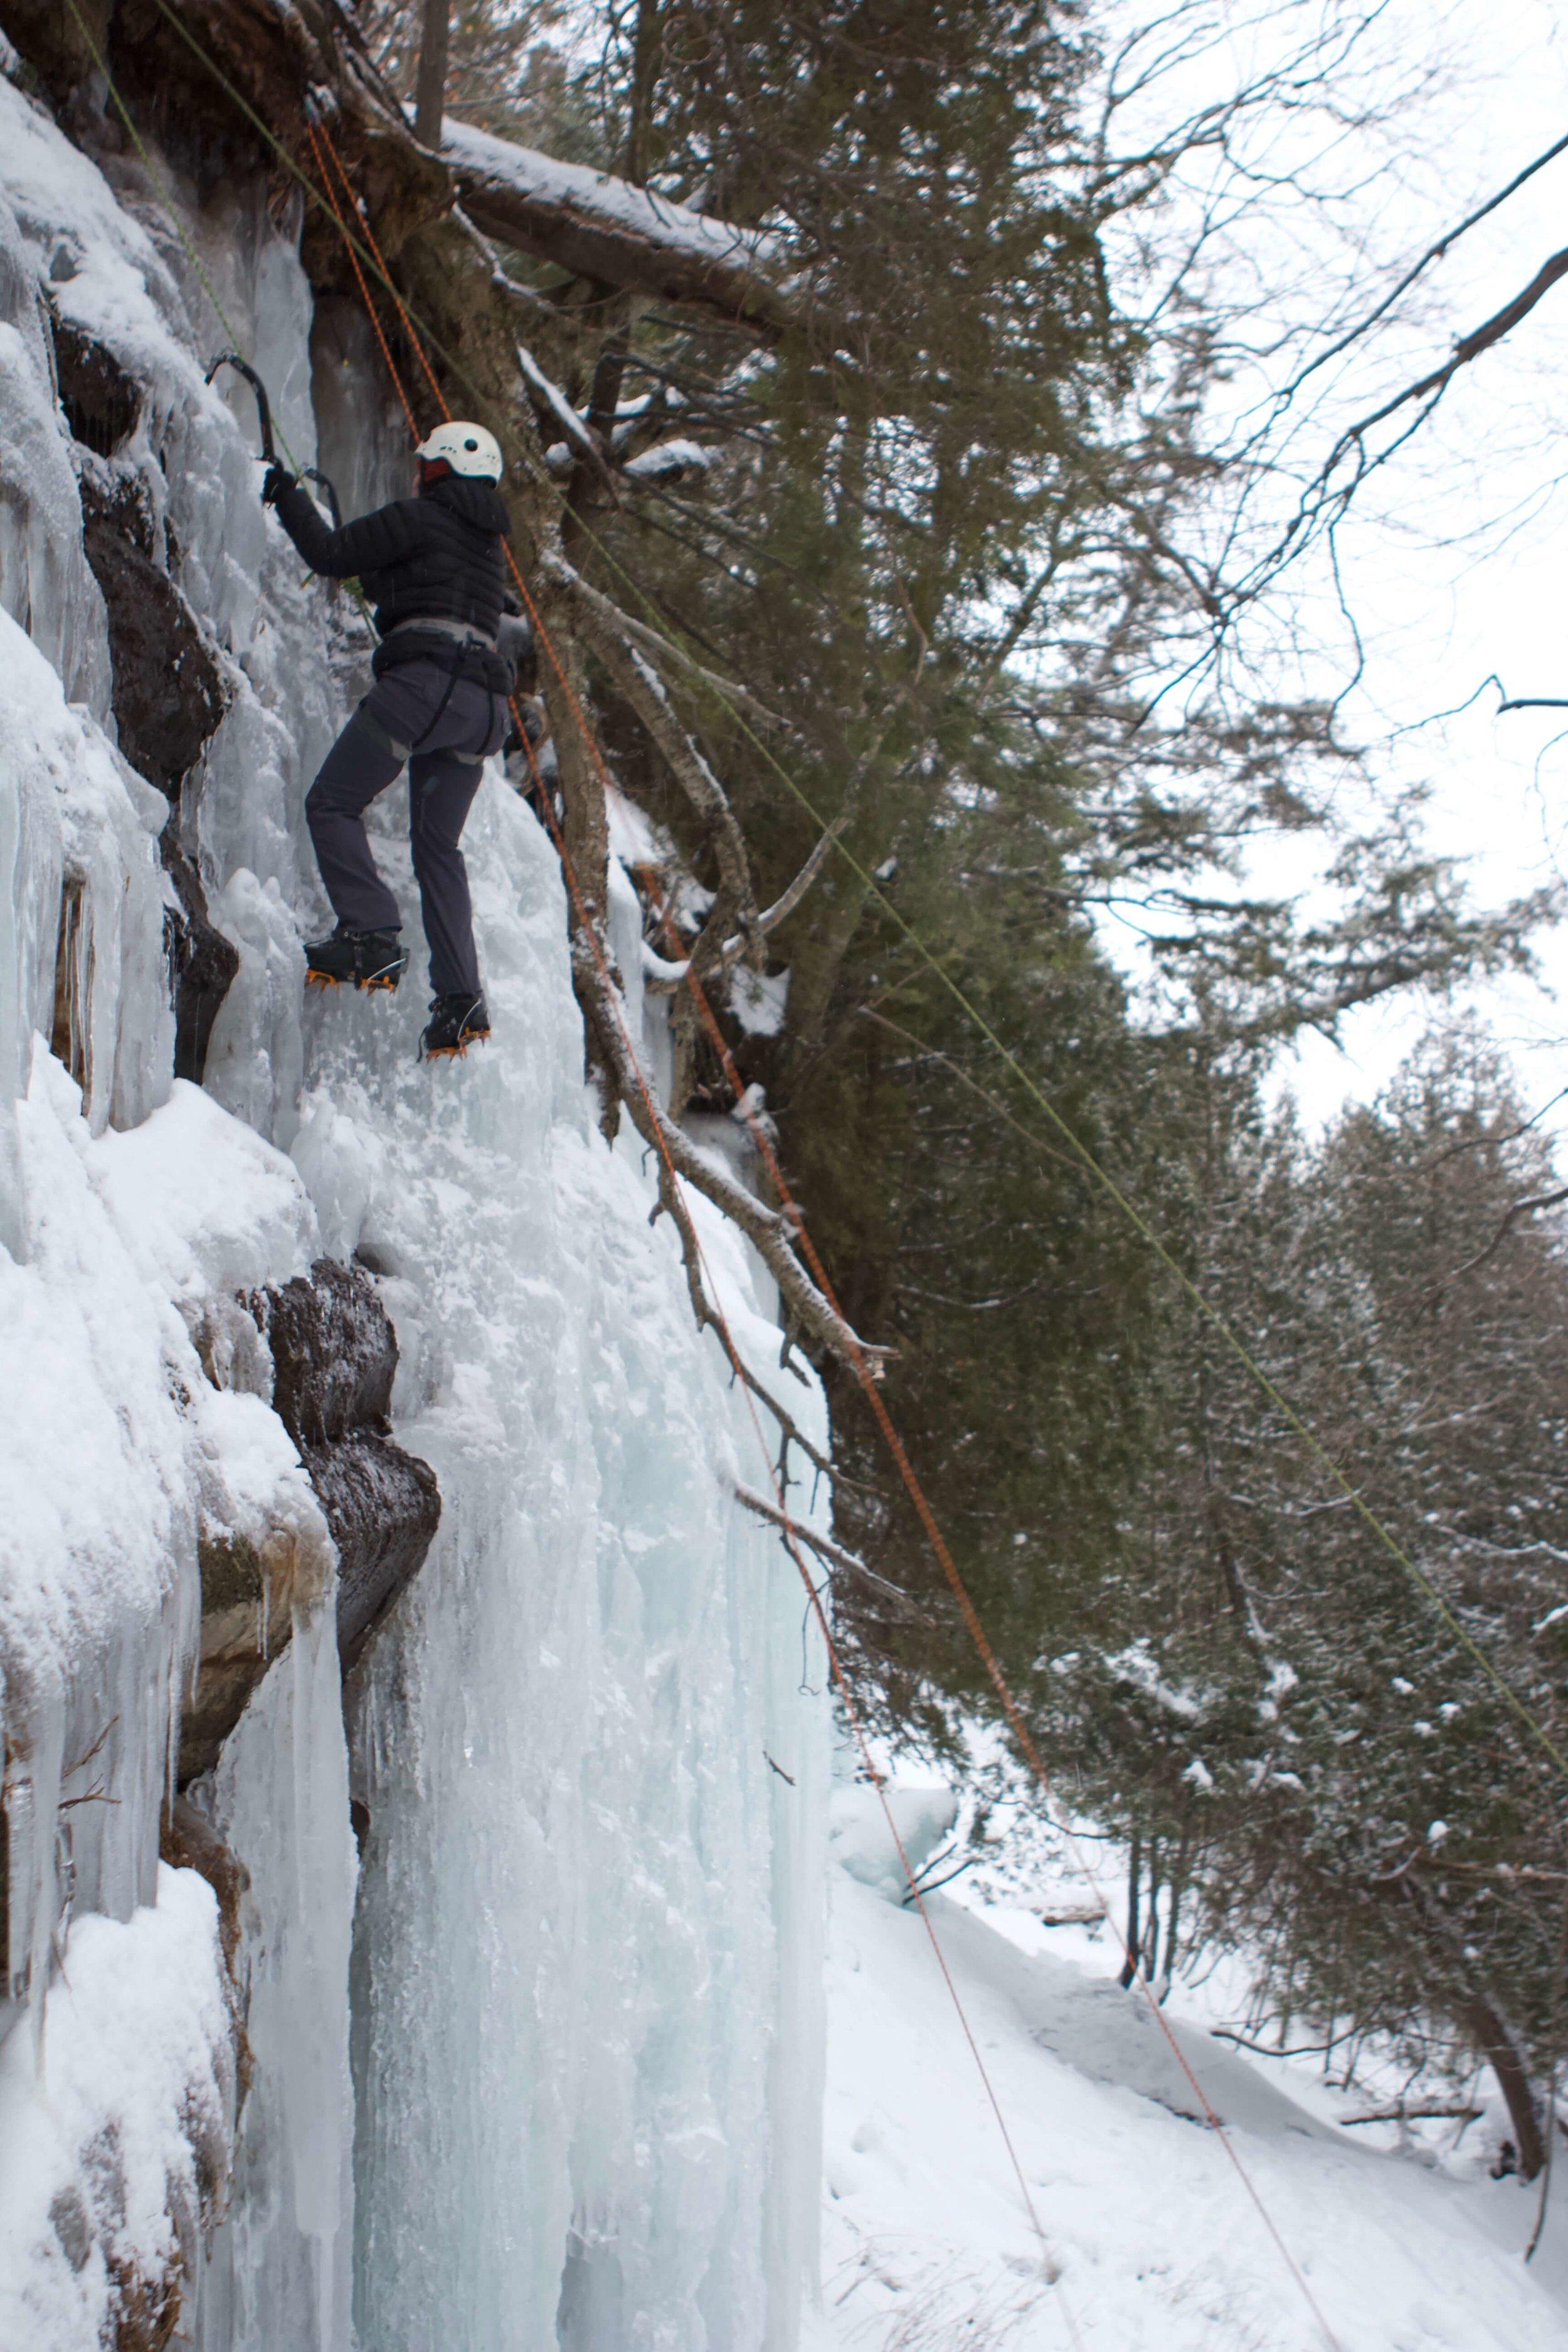 ice-climbing-michigan-emsontheroad.jpg